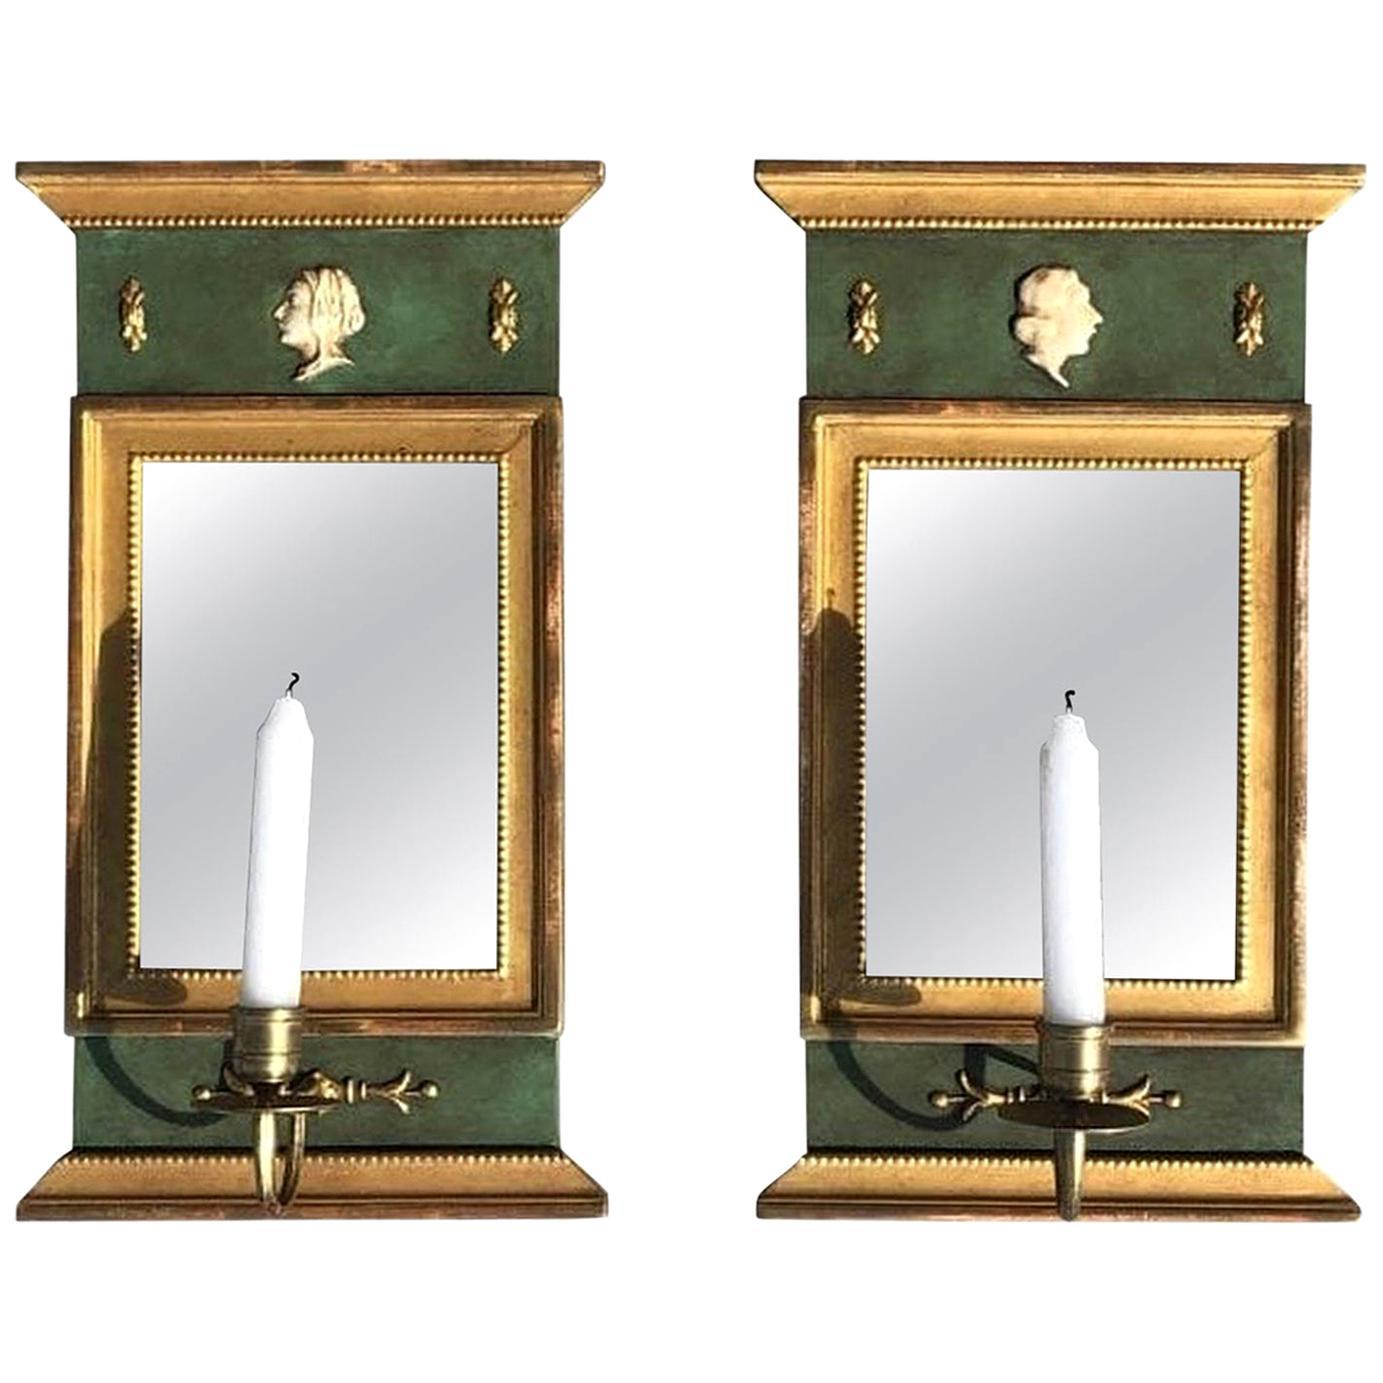 20th Century Swedish Pair of Gustavian Wood Wall Mirrors, Sconces by Kurt Ekvall